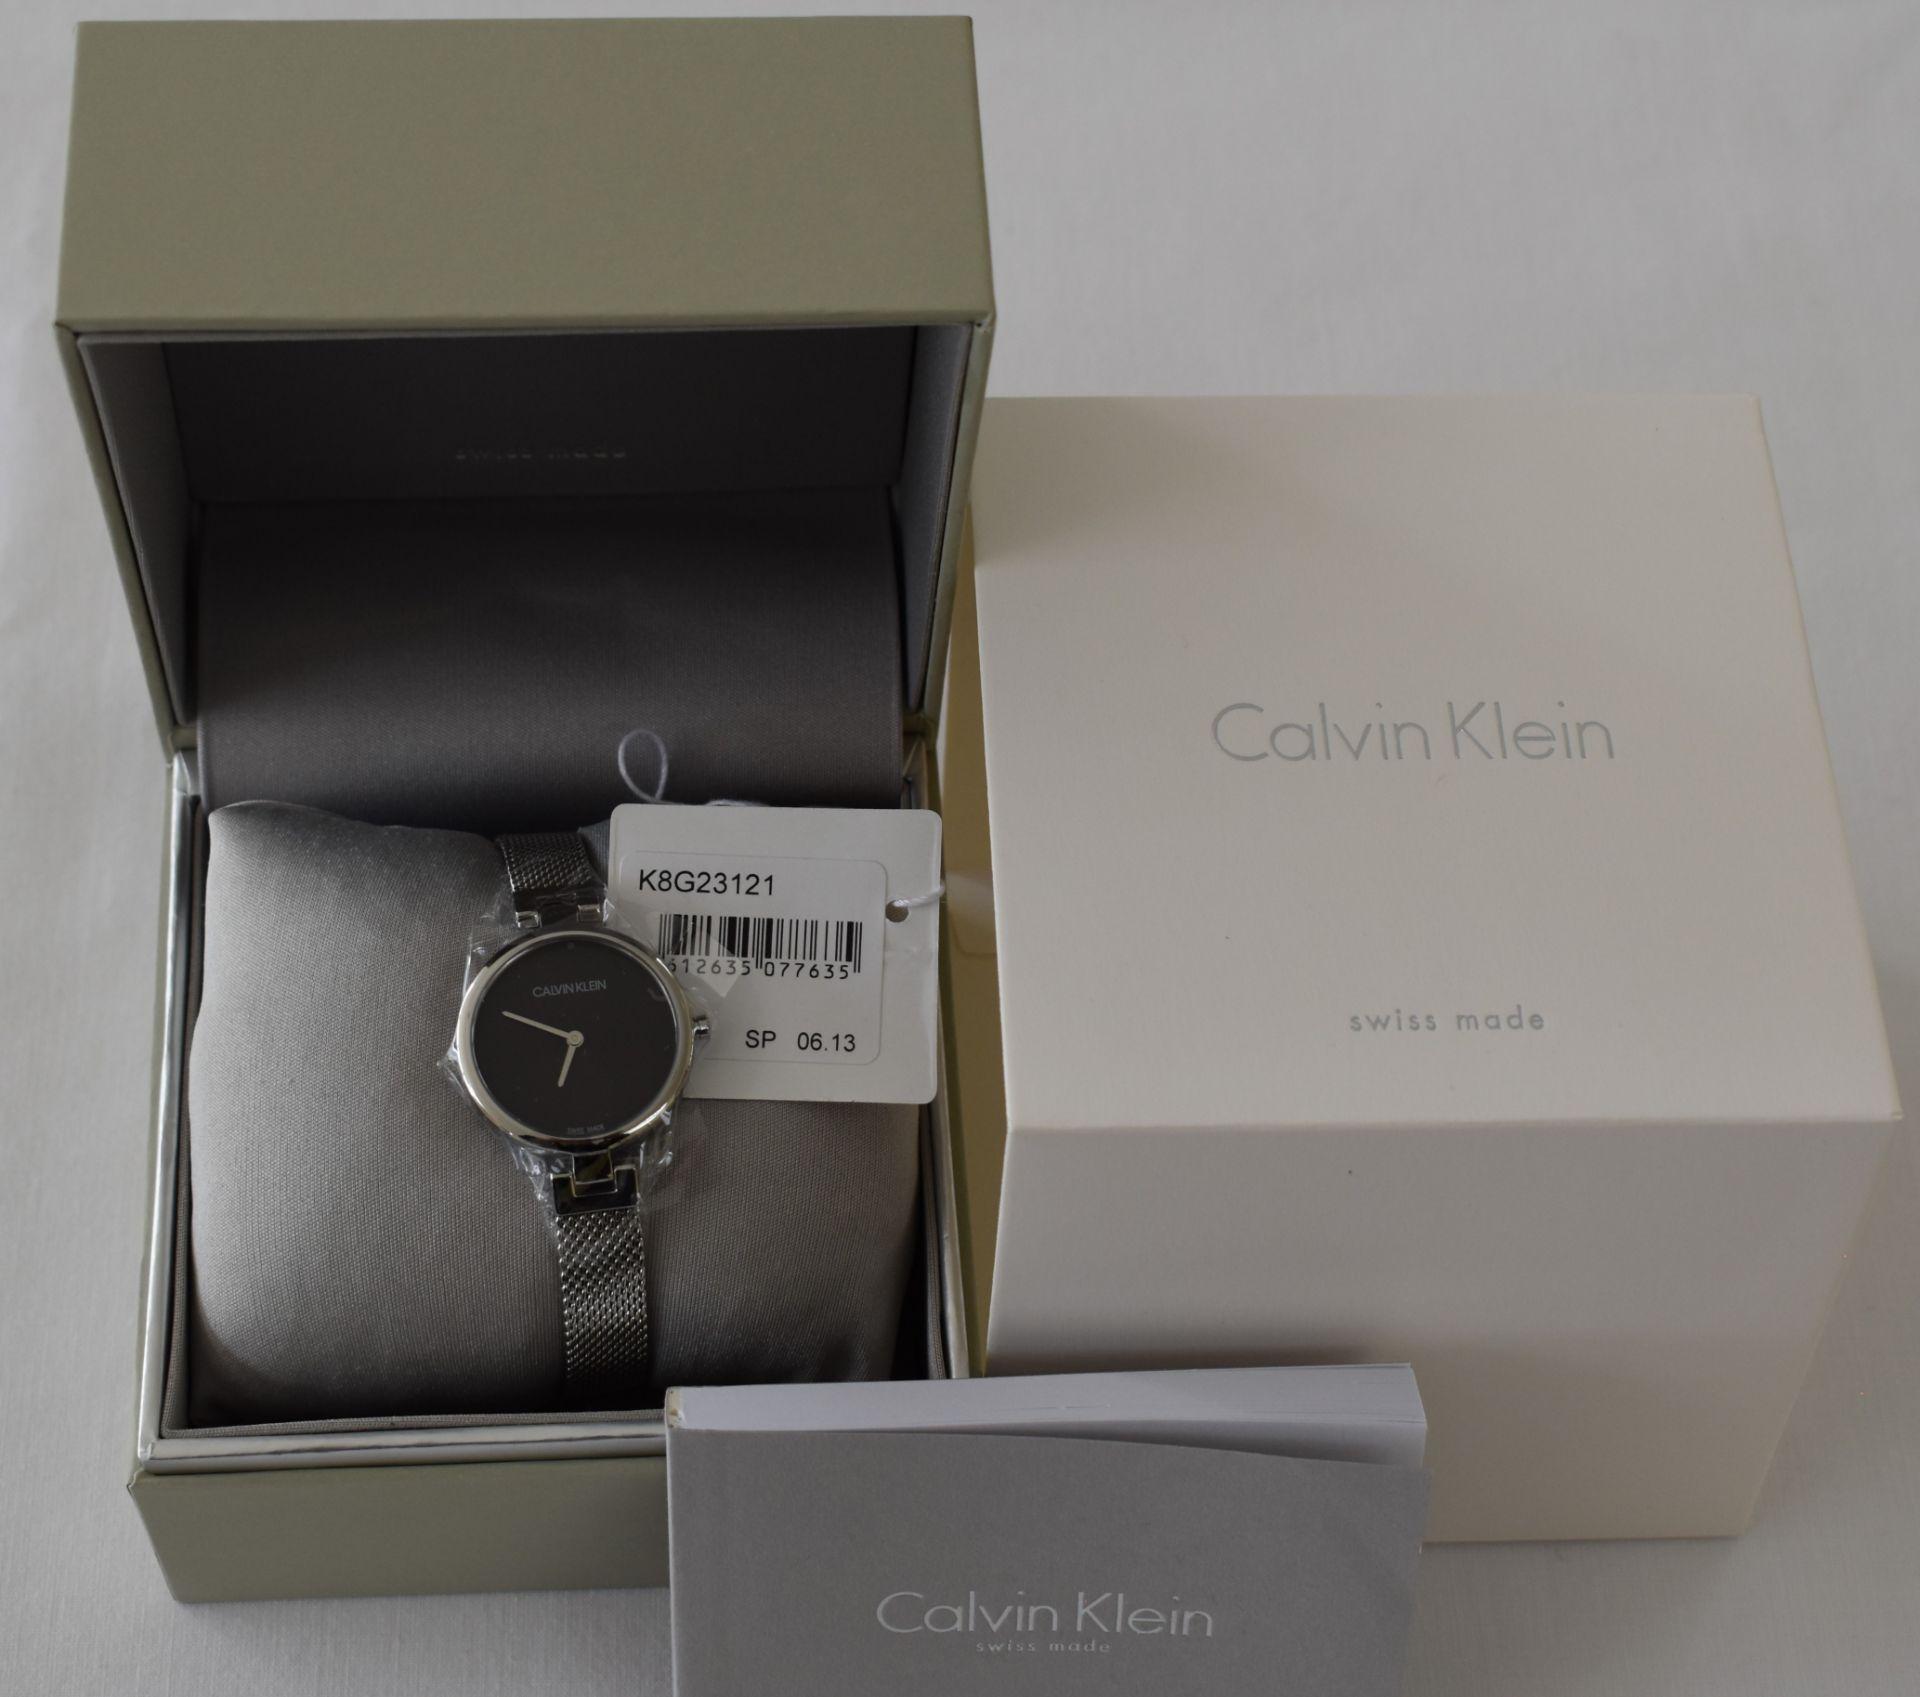 Calvin klein K8G23121 Ladies watch - Image 2 of 2